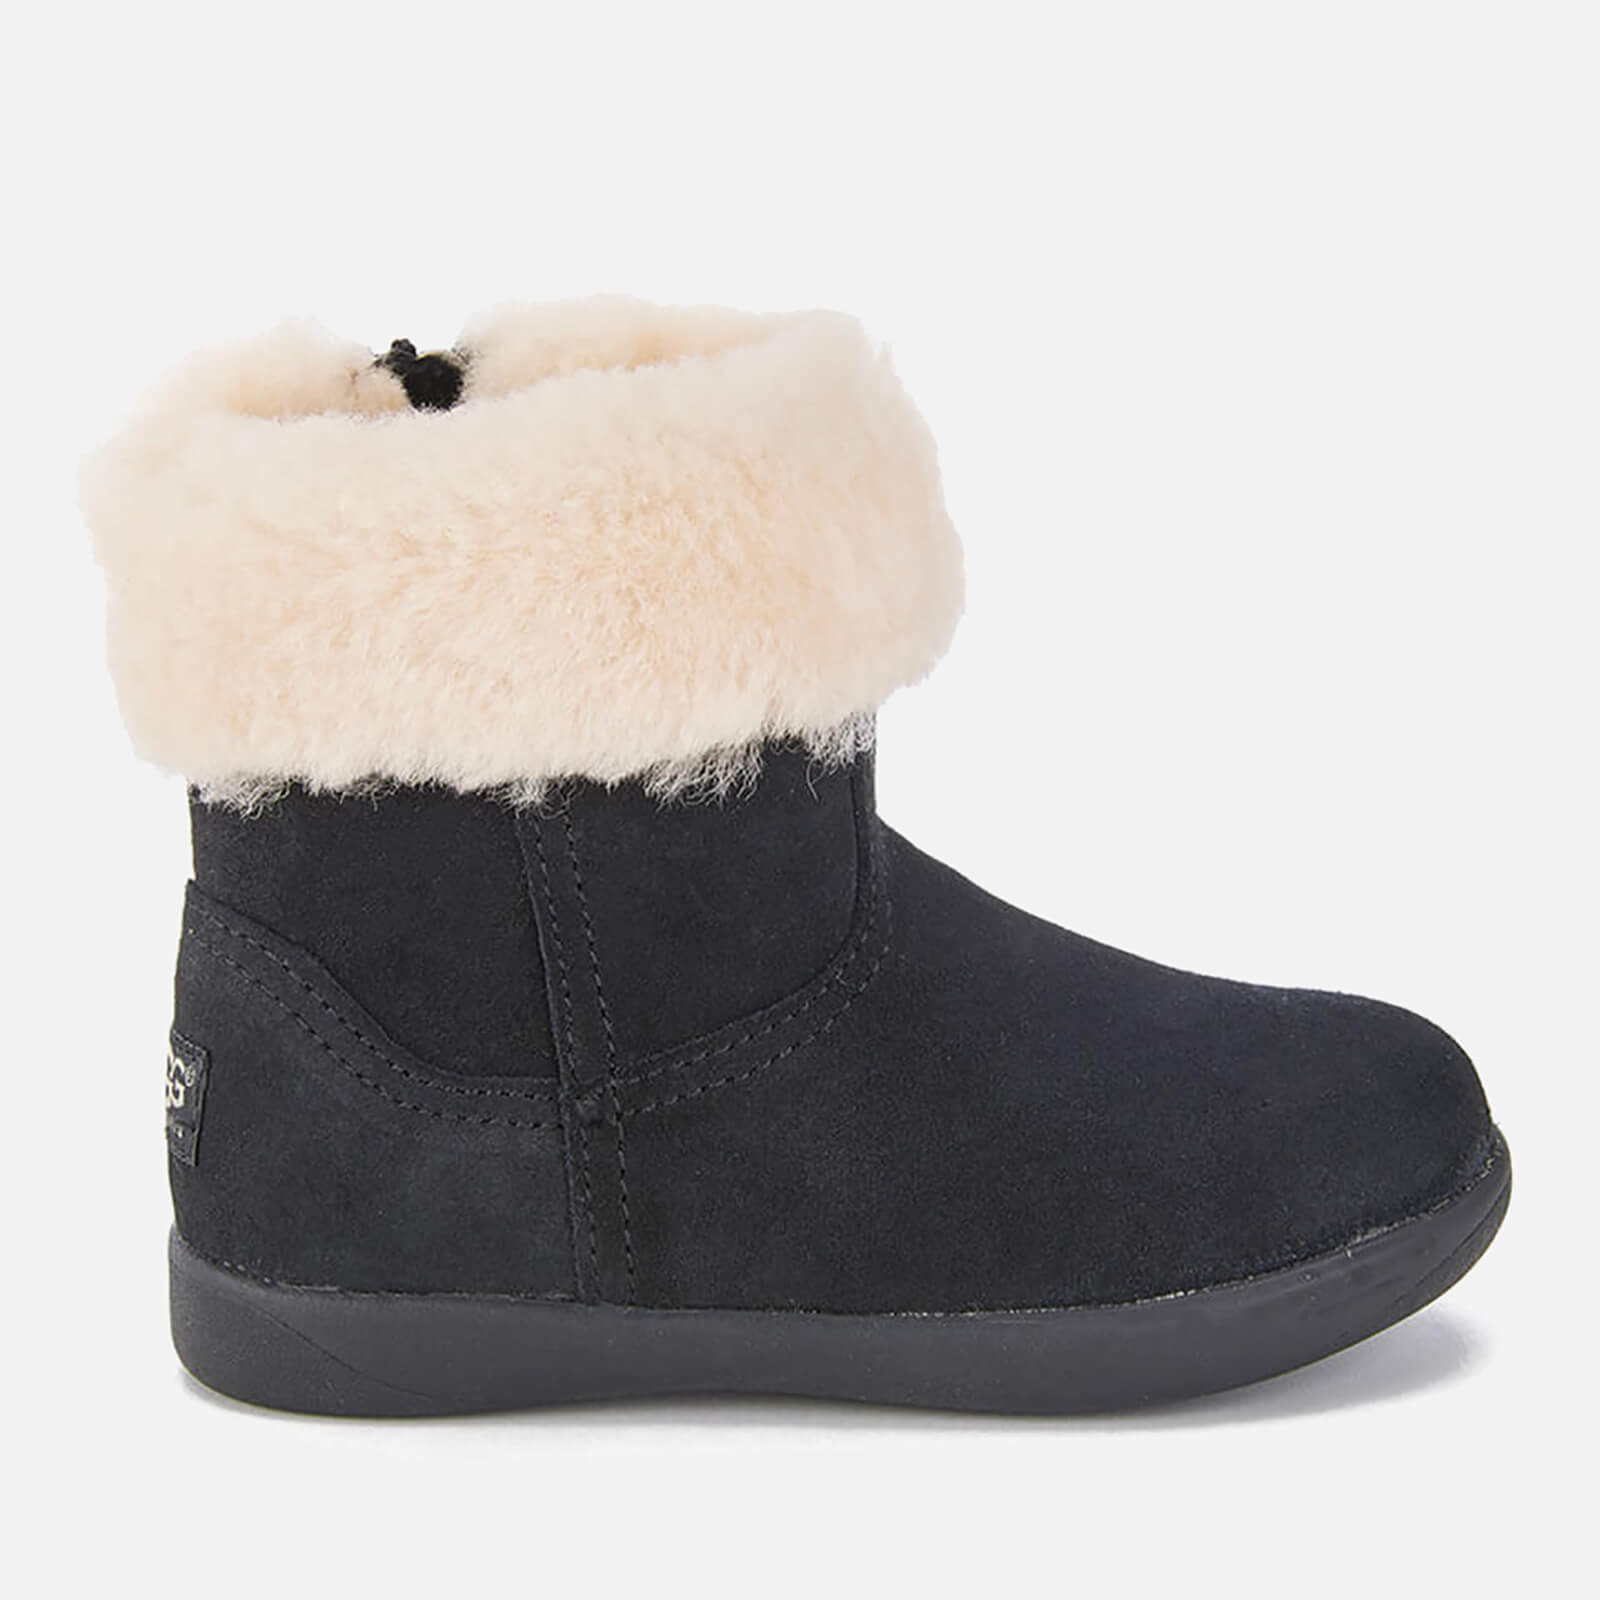 554508ad41d UGG Toddlers' Jorie II Sheepskin Collar Suede Boots - Black